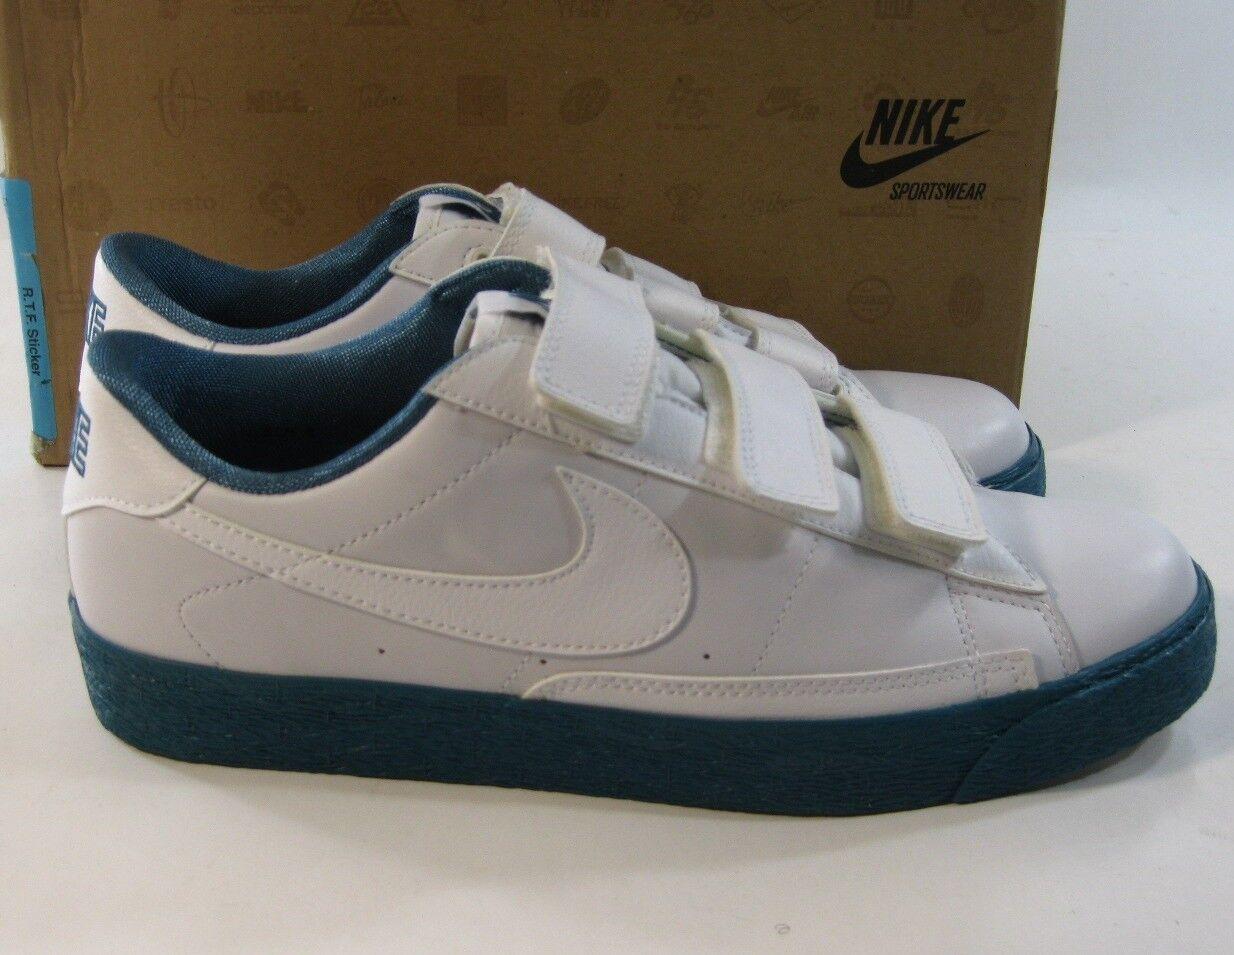 New Nike Blazer Ac 347637-103 Weiß Mens Basketball schuhe Weiß, Blau Größe 9